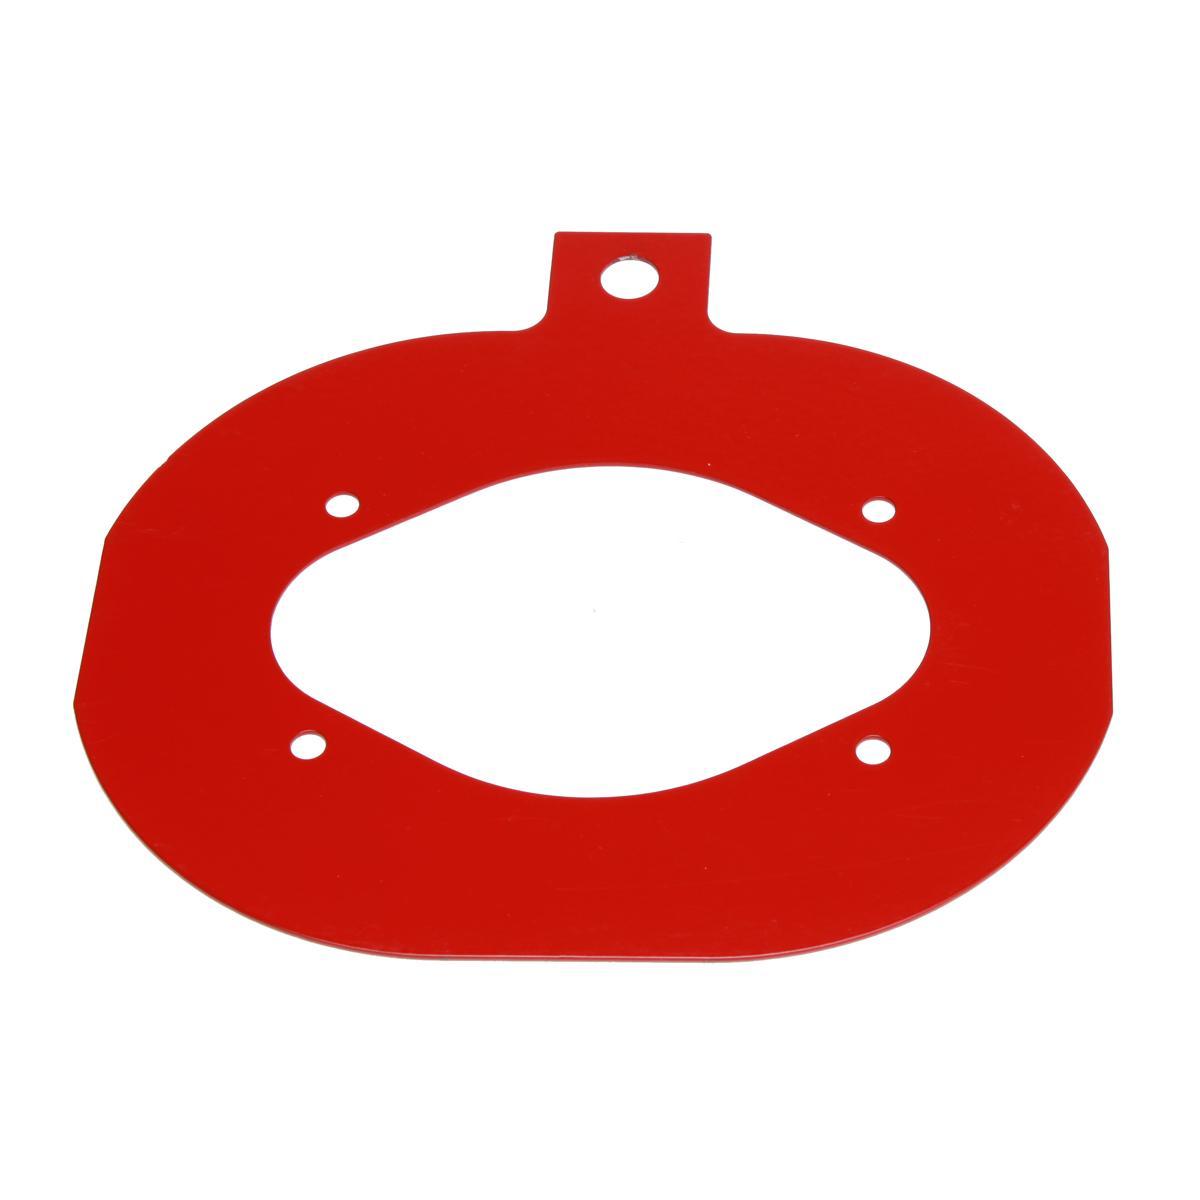 Itg jc20 baseplate 6jc20 from merlin motorsport for Motor base plate design